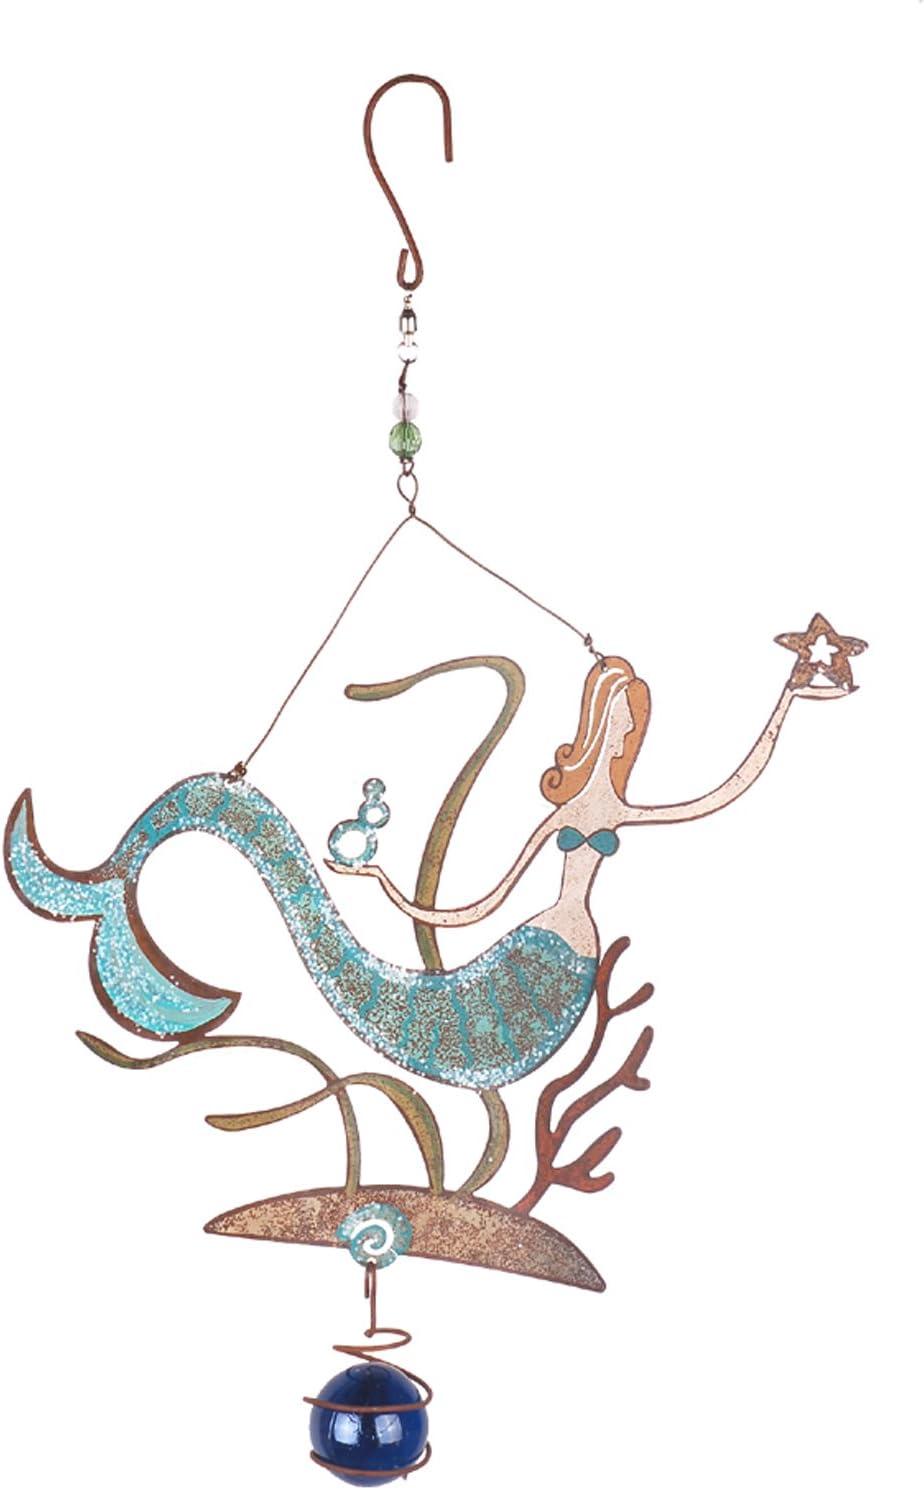 Sunset Vista Designs Meri Mermaid Decorative Spinner, 15-Inch Long